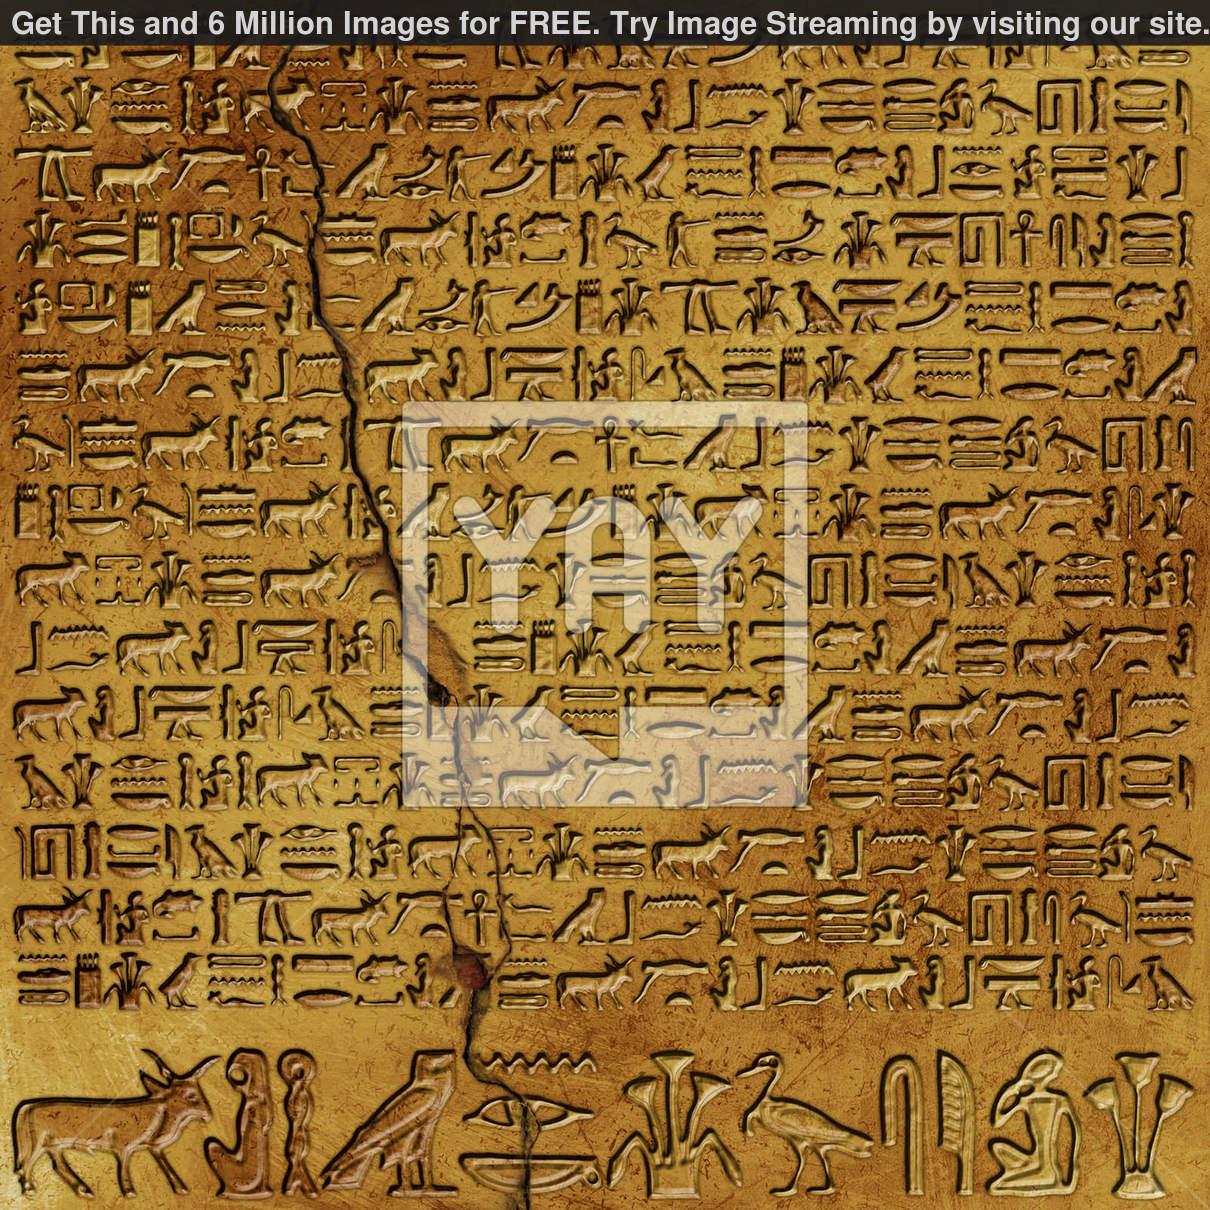 Egyptian Hieroglyphics Wallpaper 1210x1210